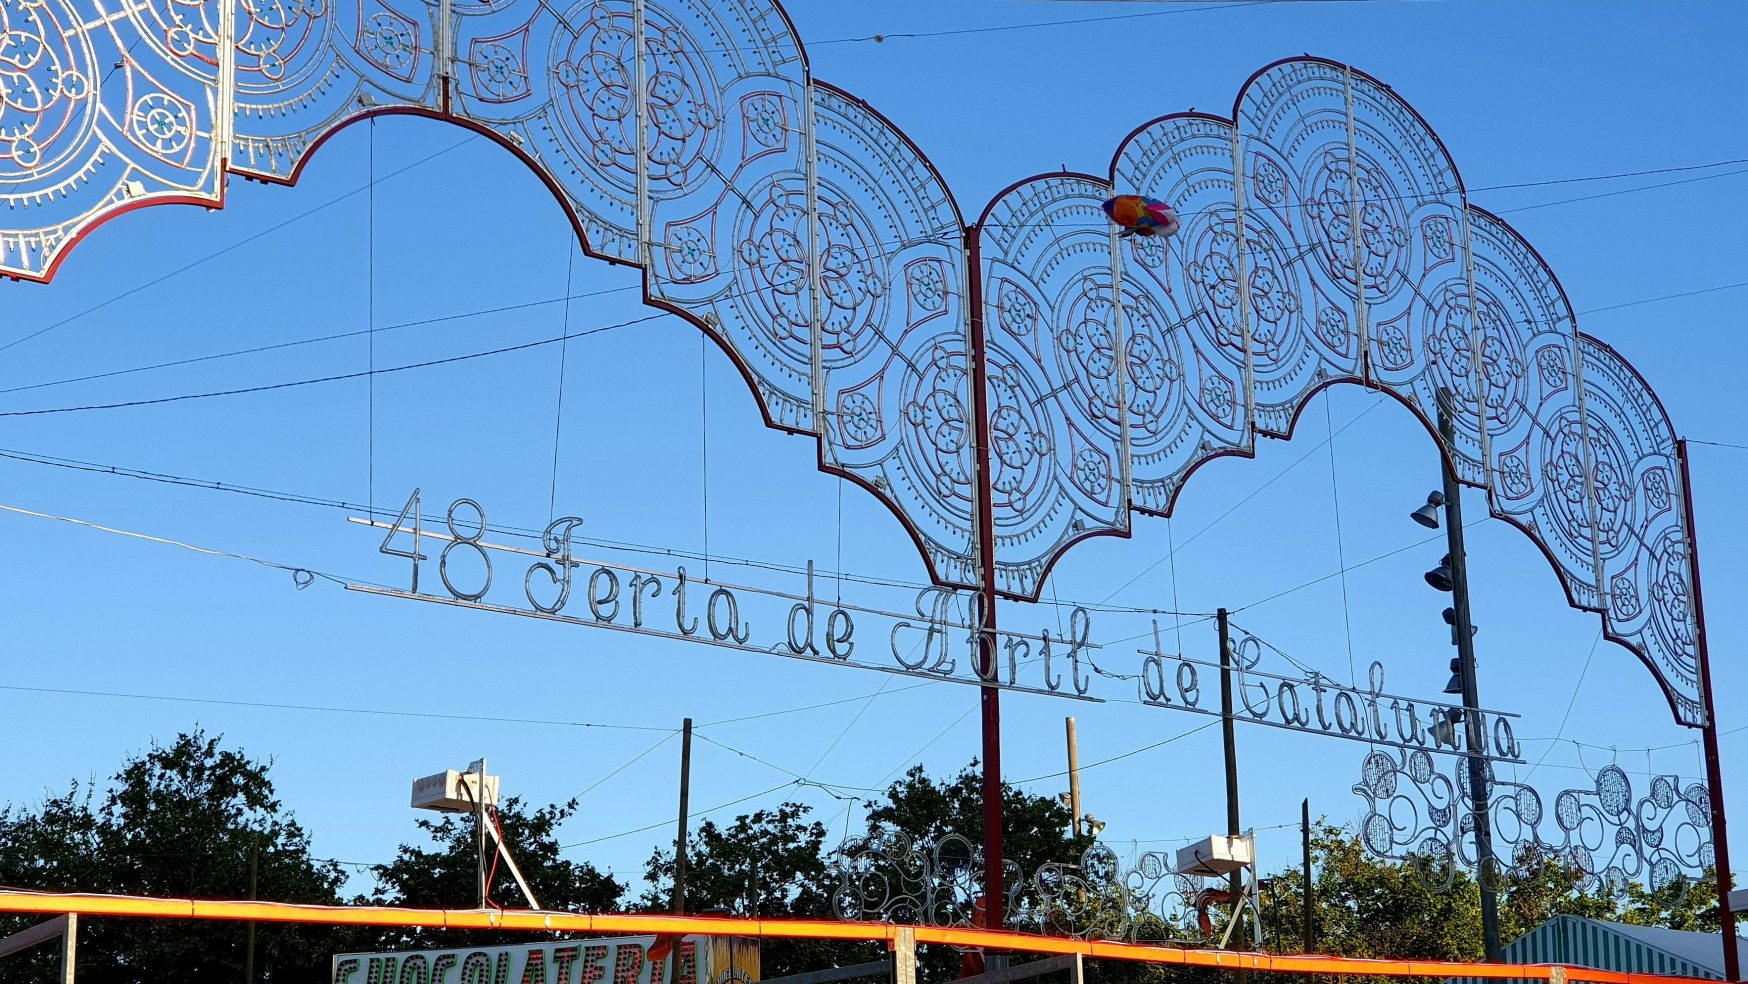 48 Feria de Abril de Catalunya: ¿éxito o fracaso?